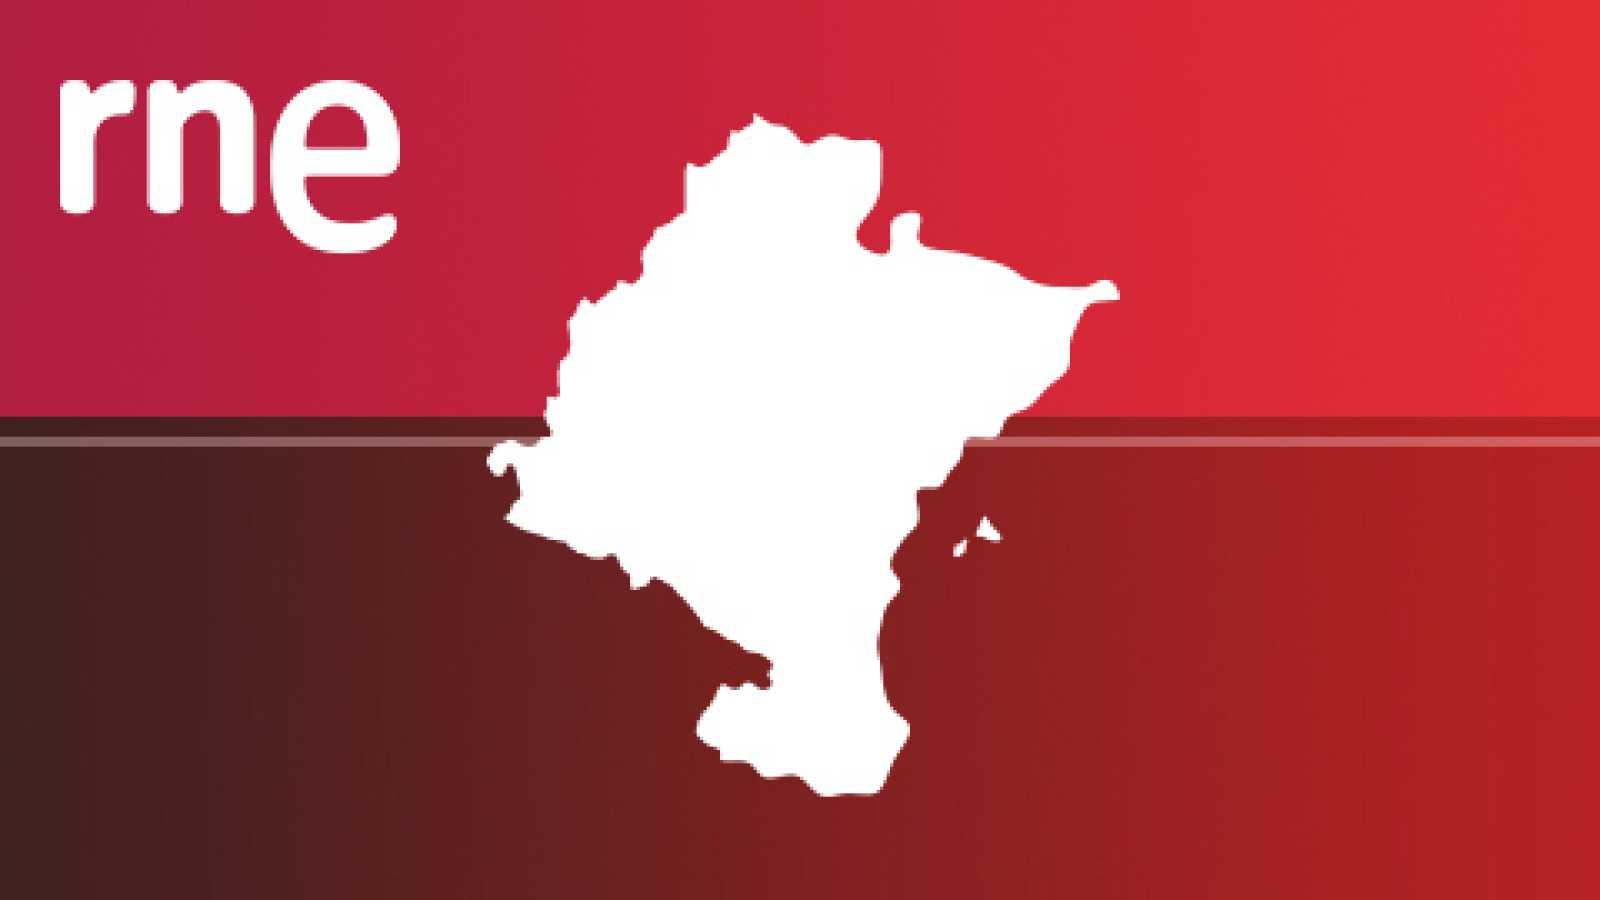 Entrevista Enrique Maya (alcalde Pamplona) - 30/06/2020 - escuchar ahora